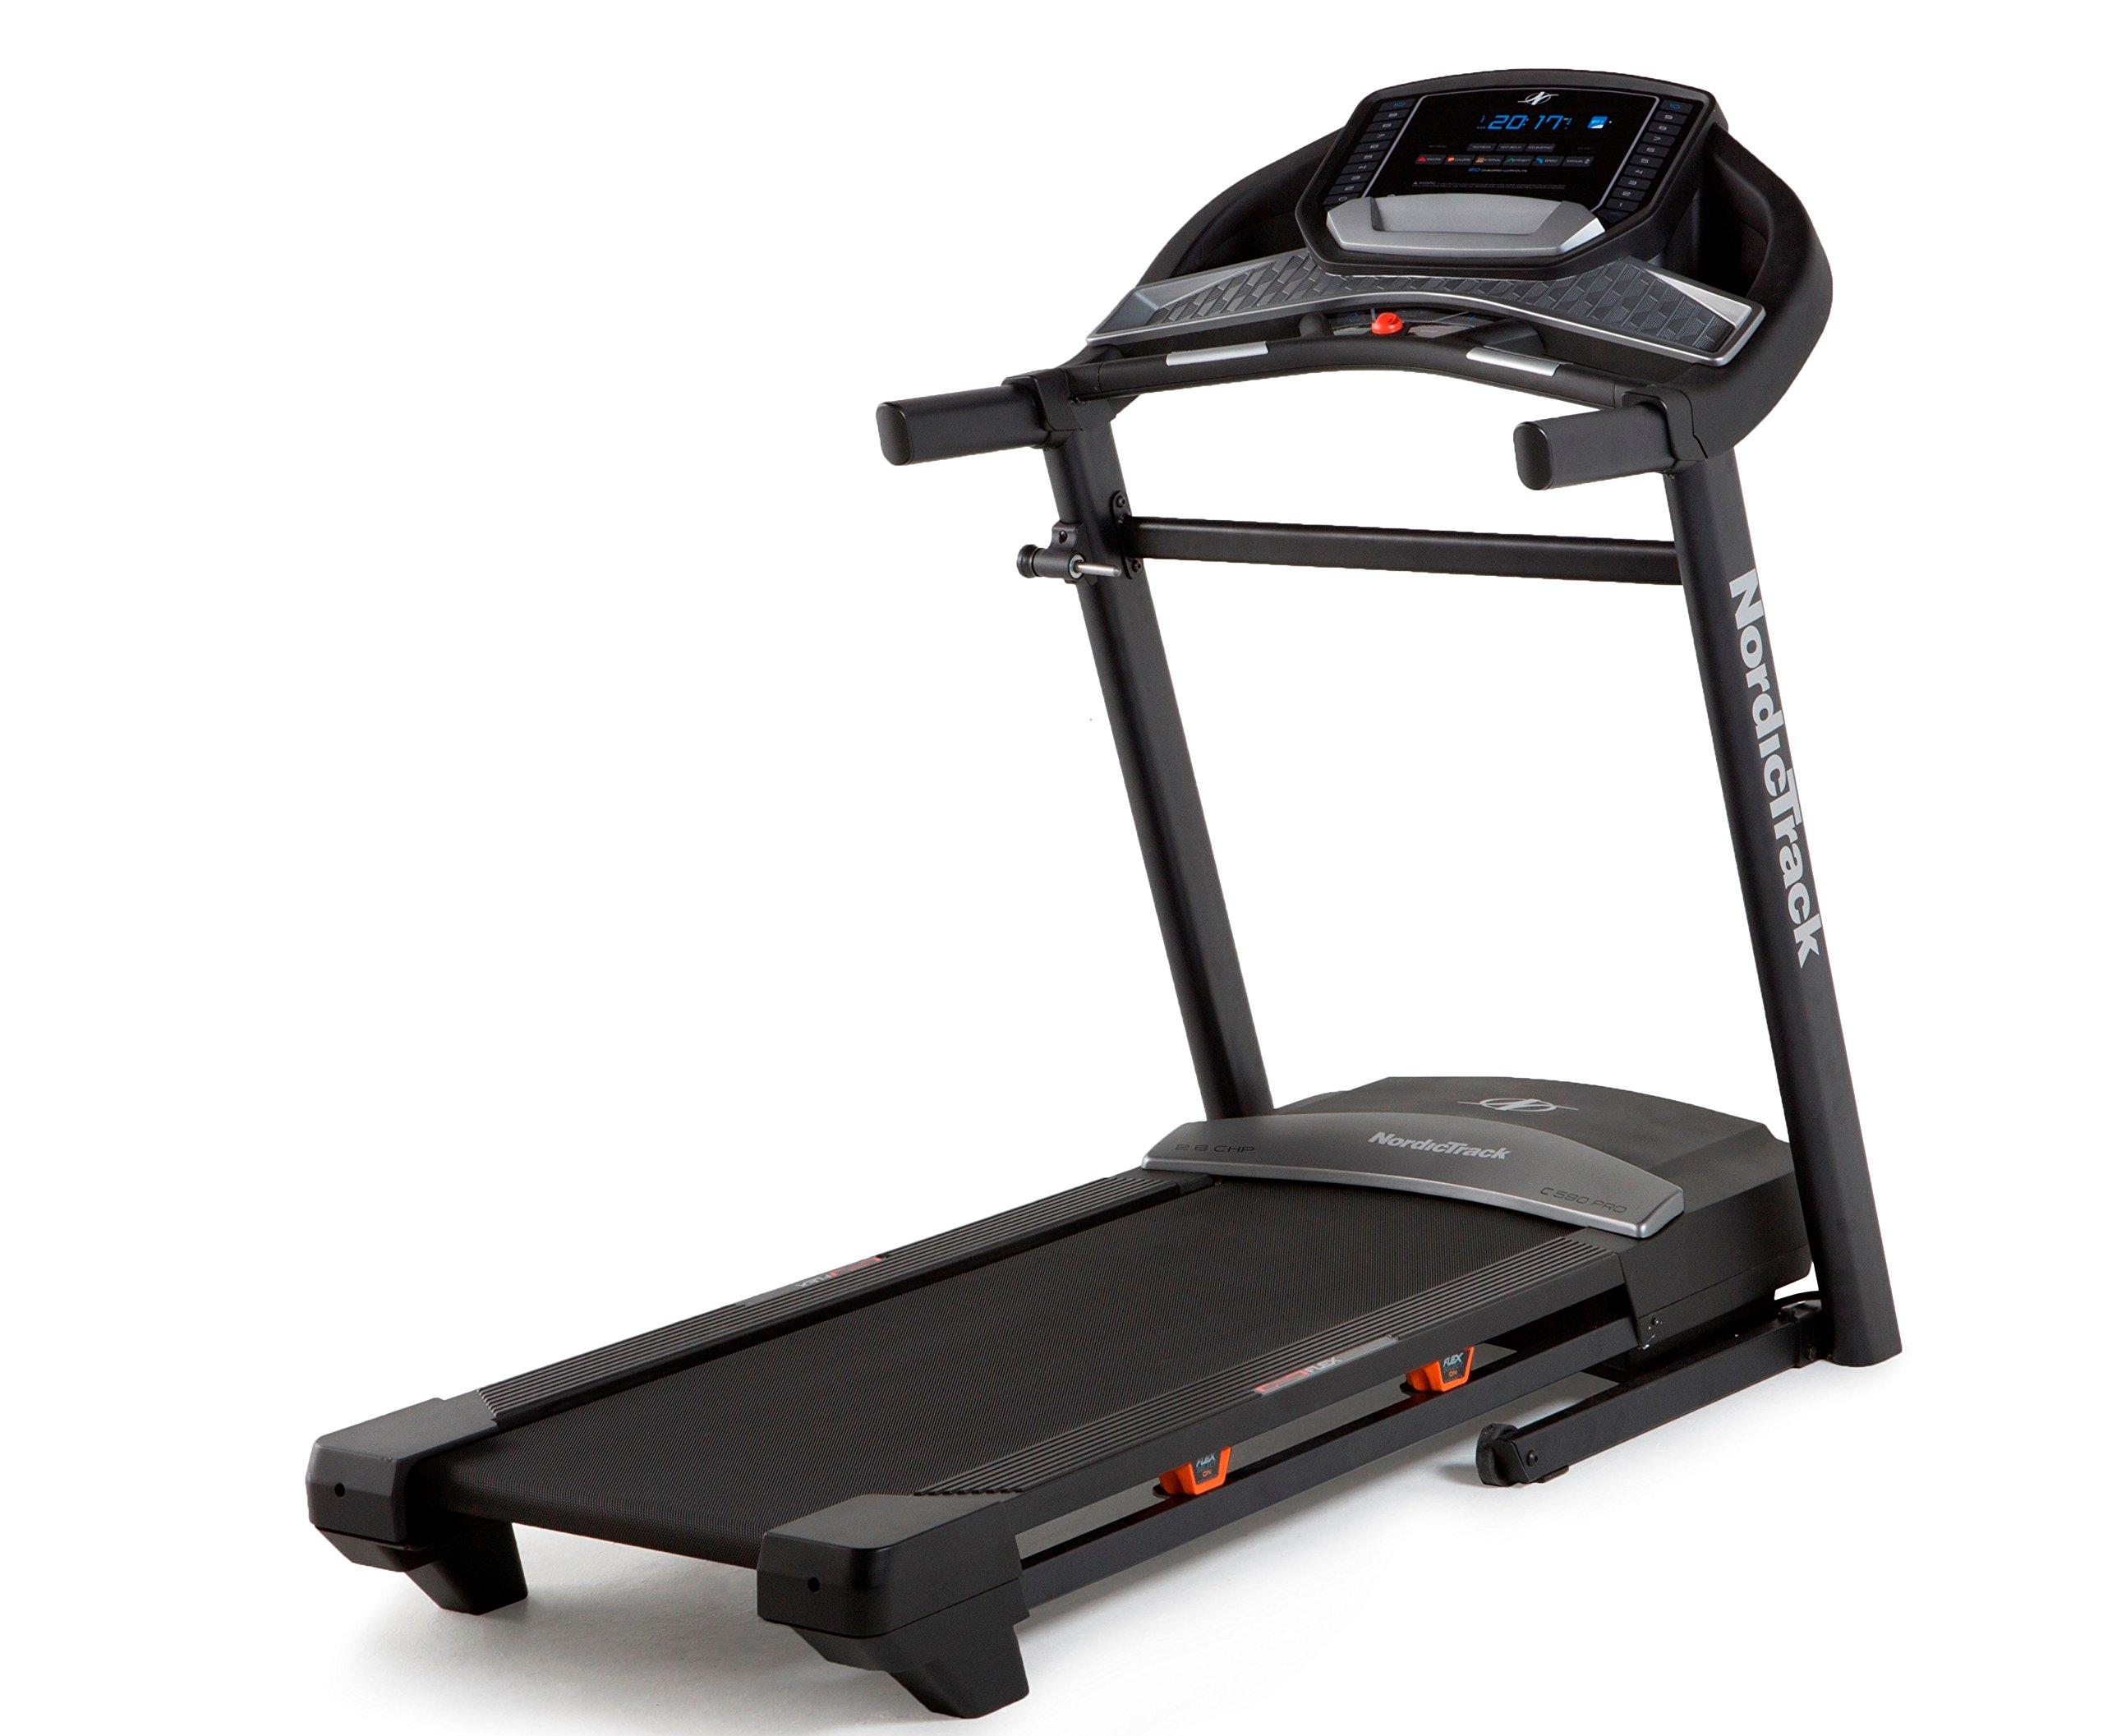 NordicTrack C 590 Pro Treadmill by NordicTrack